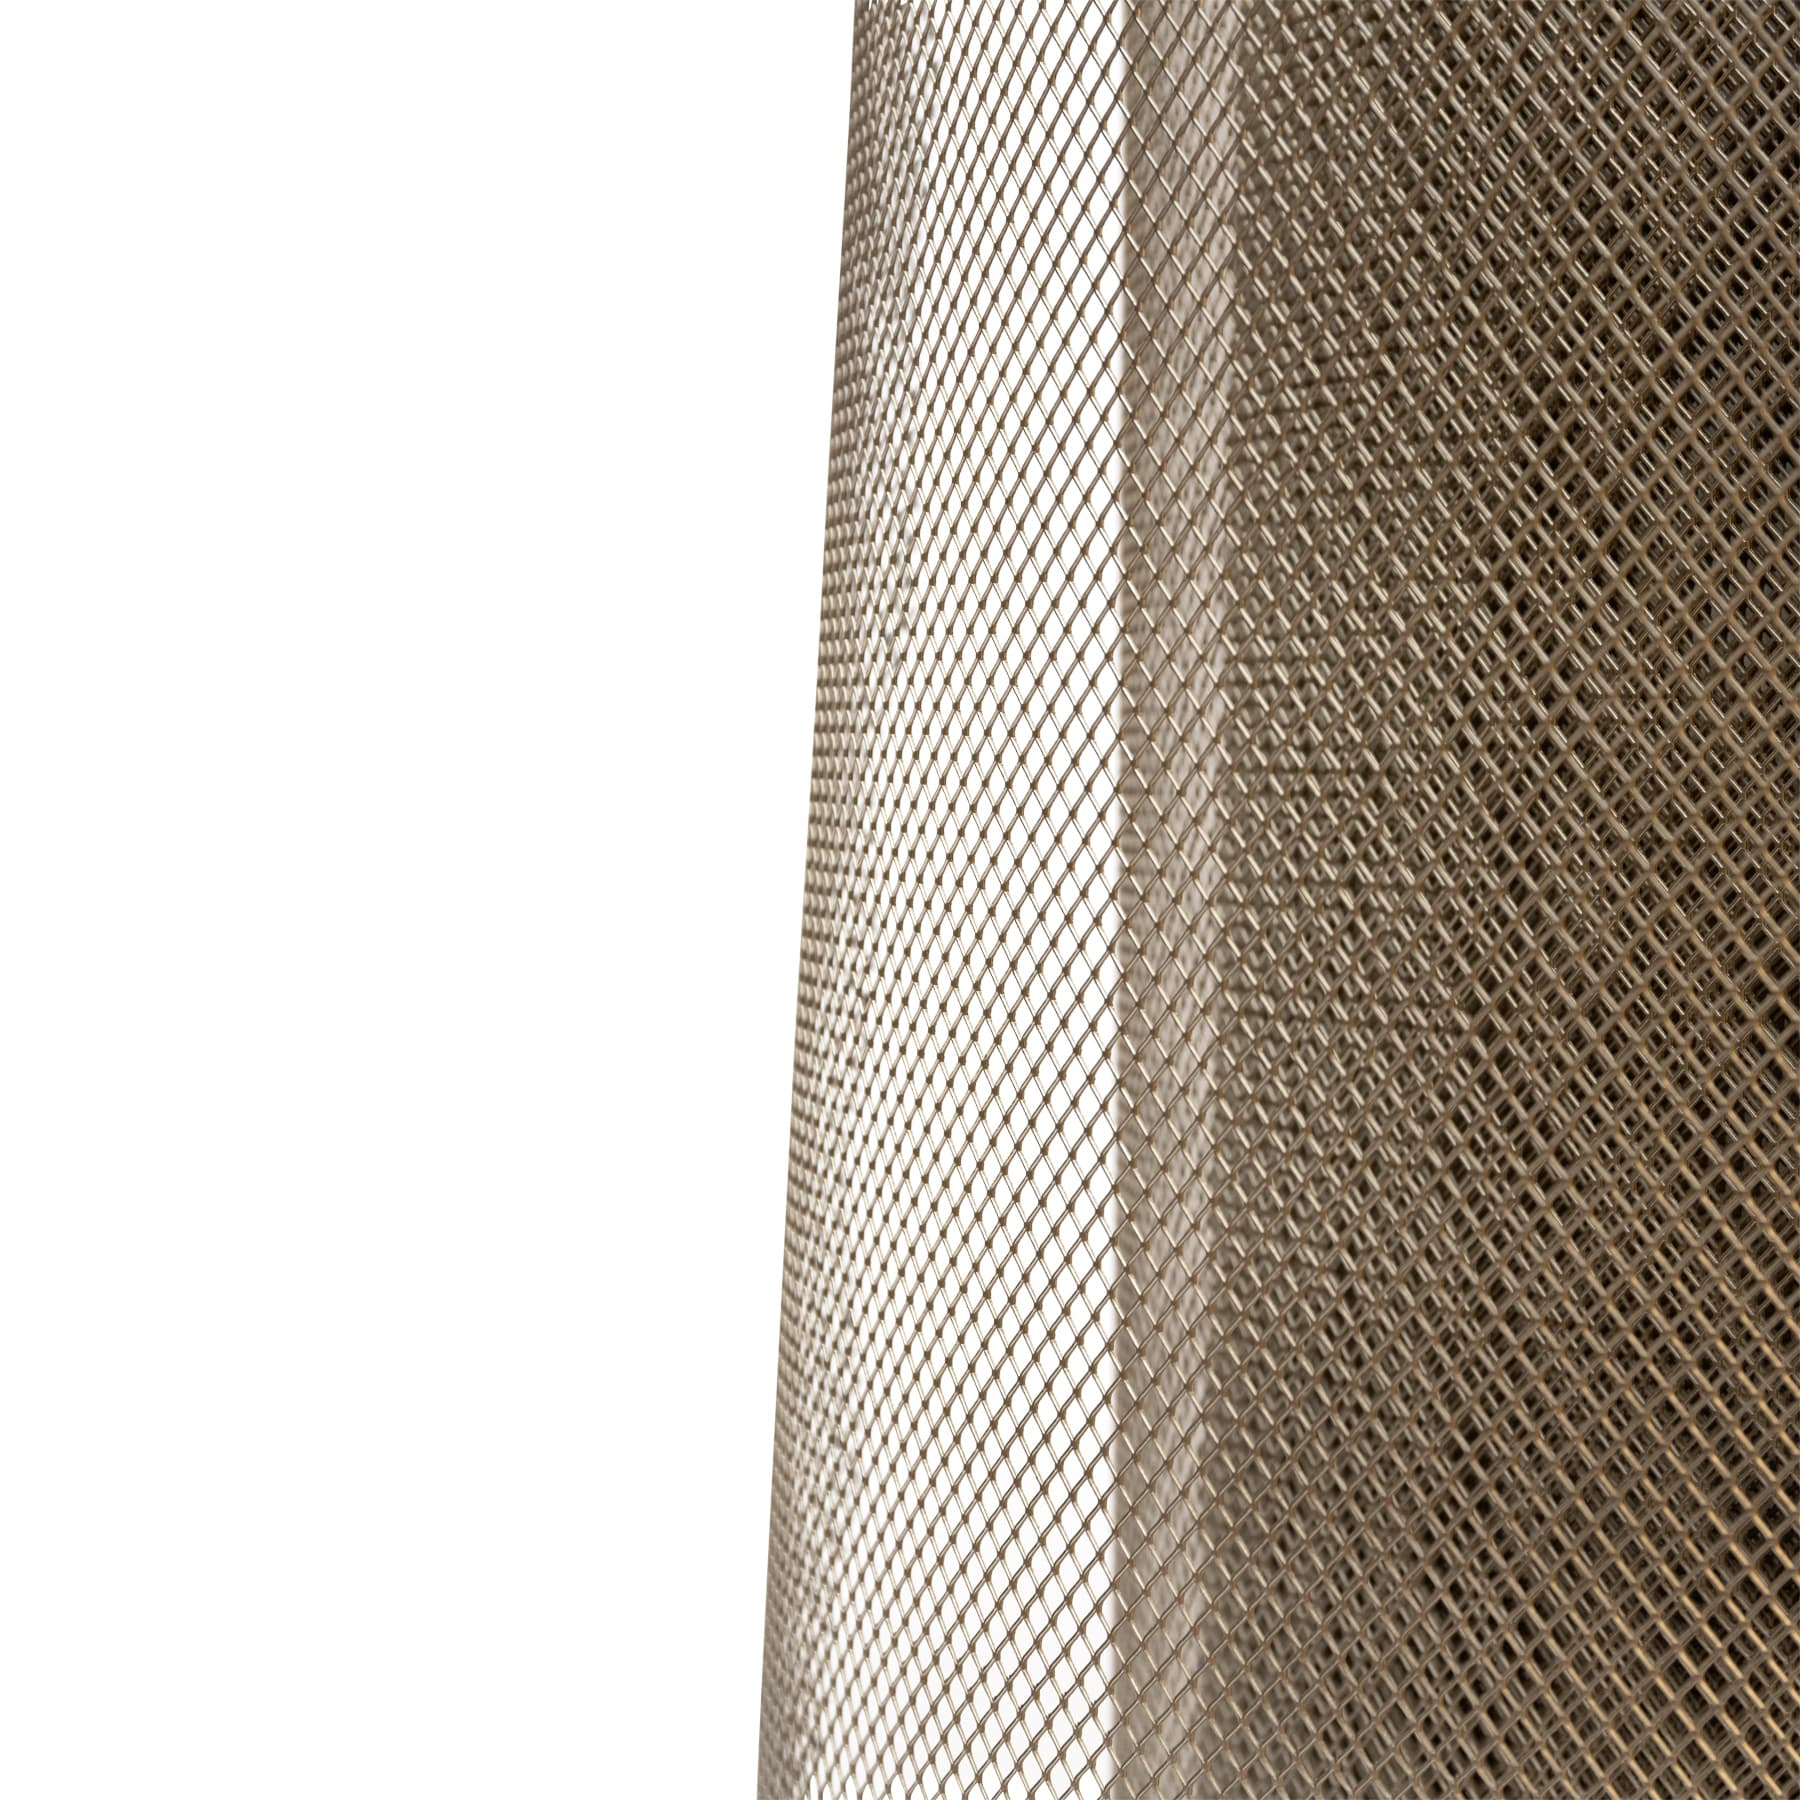 Edelstahlstreckgitter, bienendicht, Rollenware, 100 cm breit lfdm